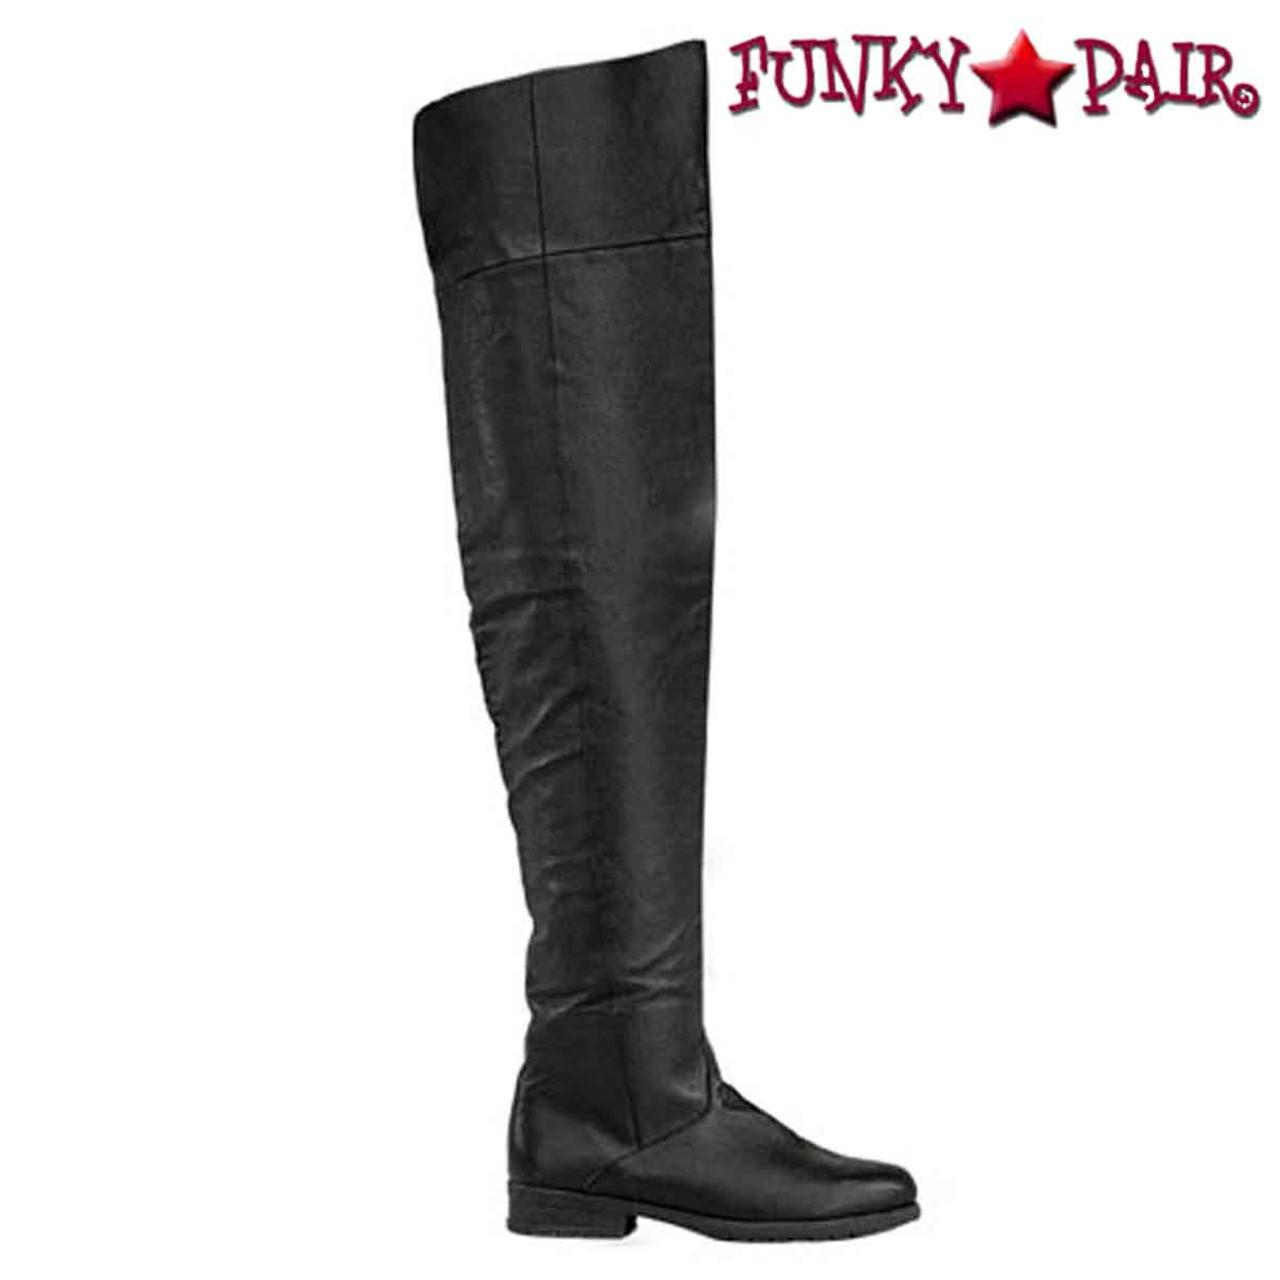 Thigh High Flat Boots Size 11